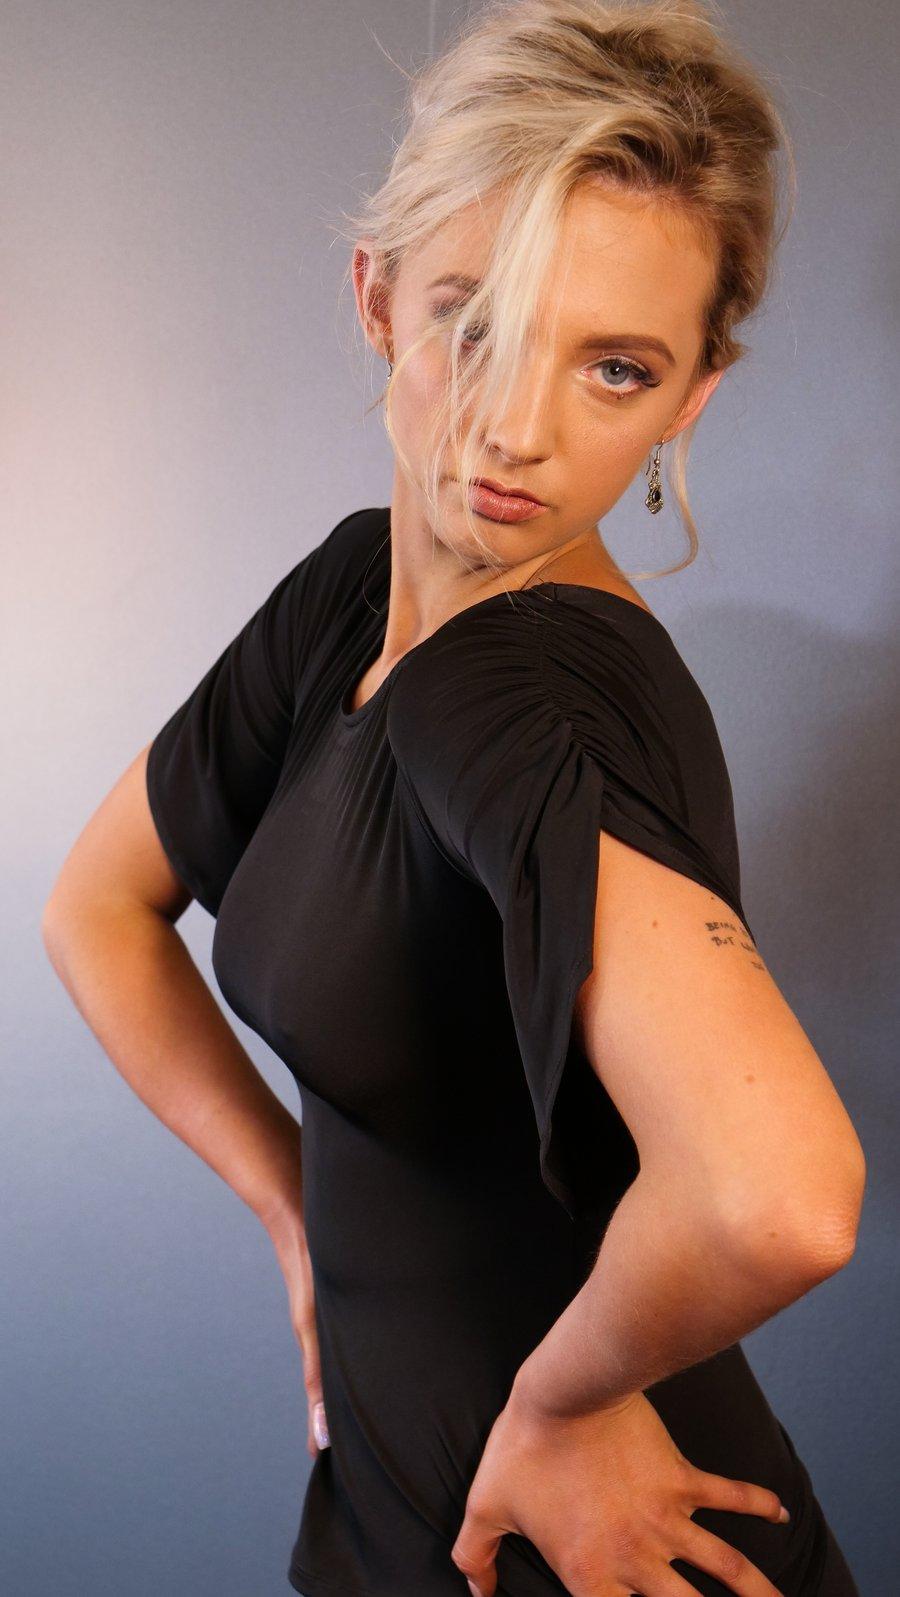 Image of Mousse Top - Black E1308 Dancewear latin ballroom